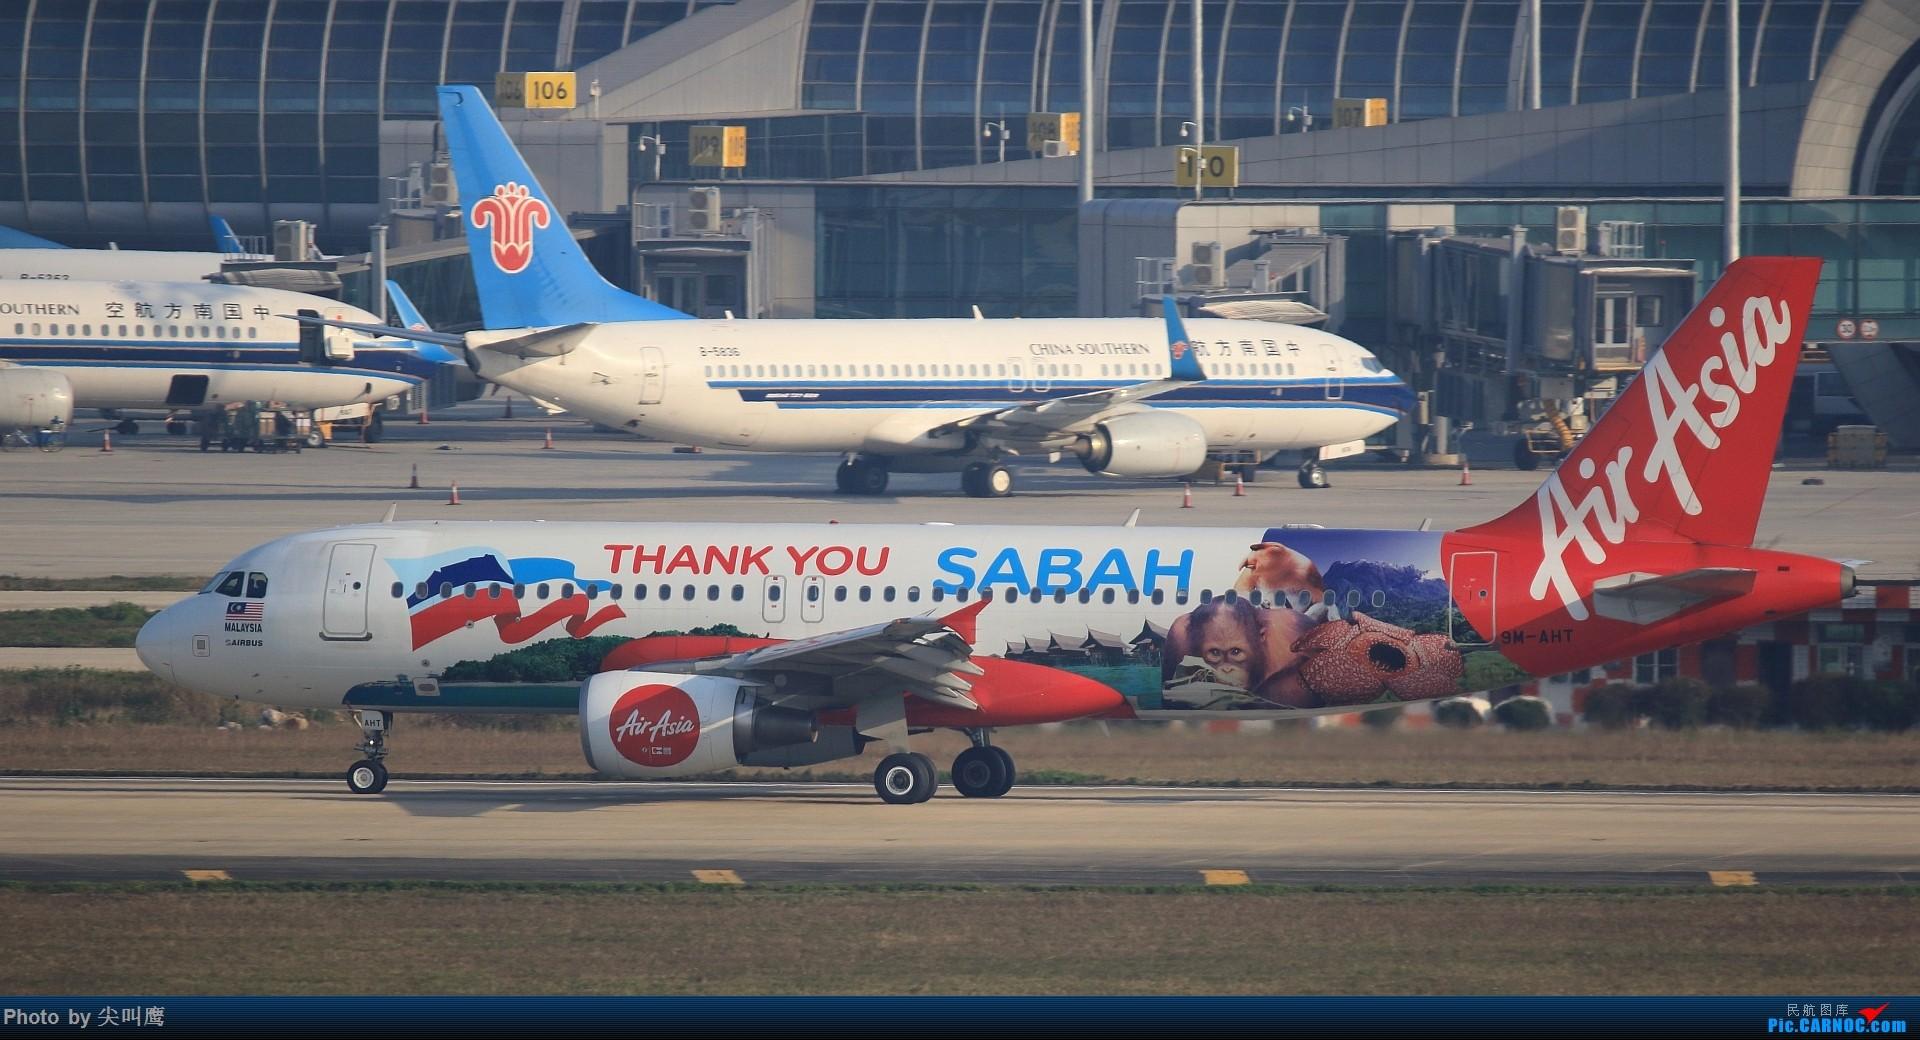 Re:[原创]NNG的马来西亚亚航小合集 AIRBUS A320-200 9M-AHT 中国南宁吴圩国际机场